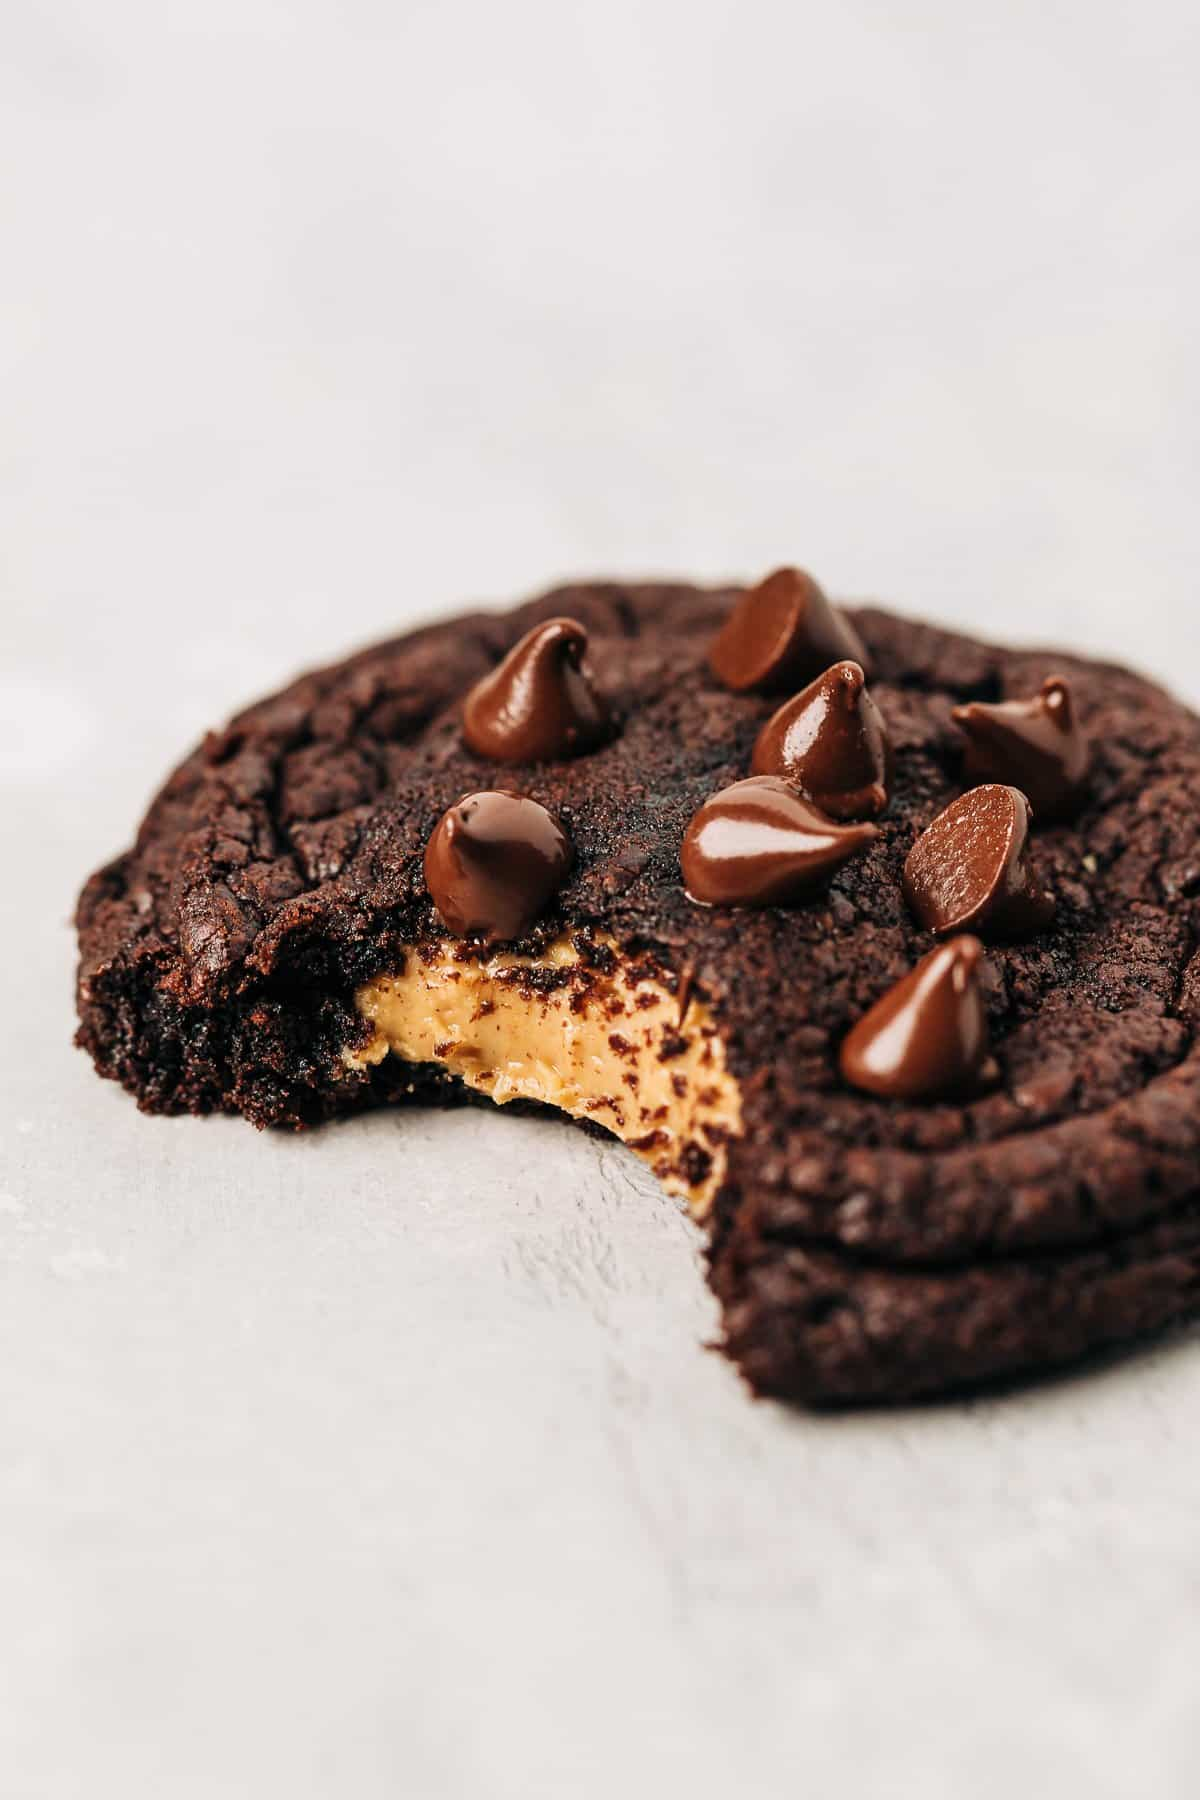 bite shot of a peanut butter stuffed chocolate cookie